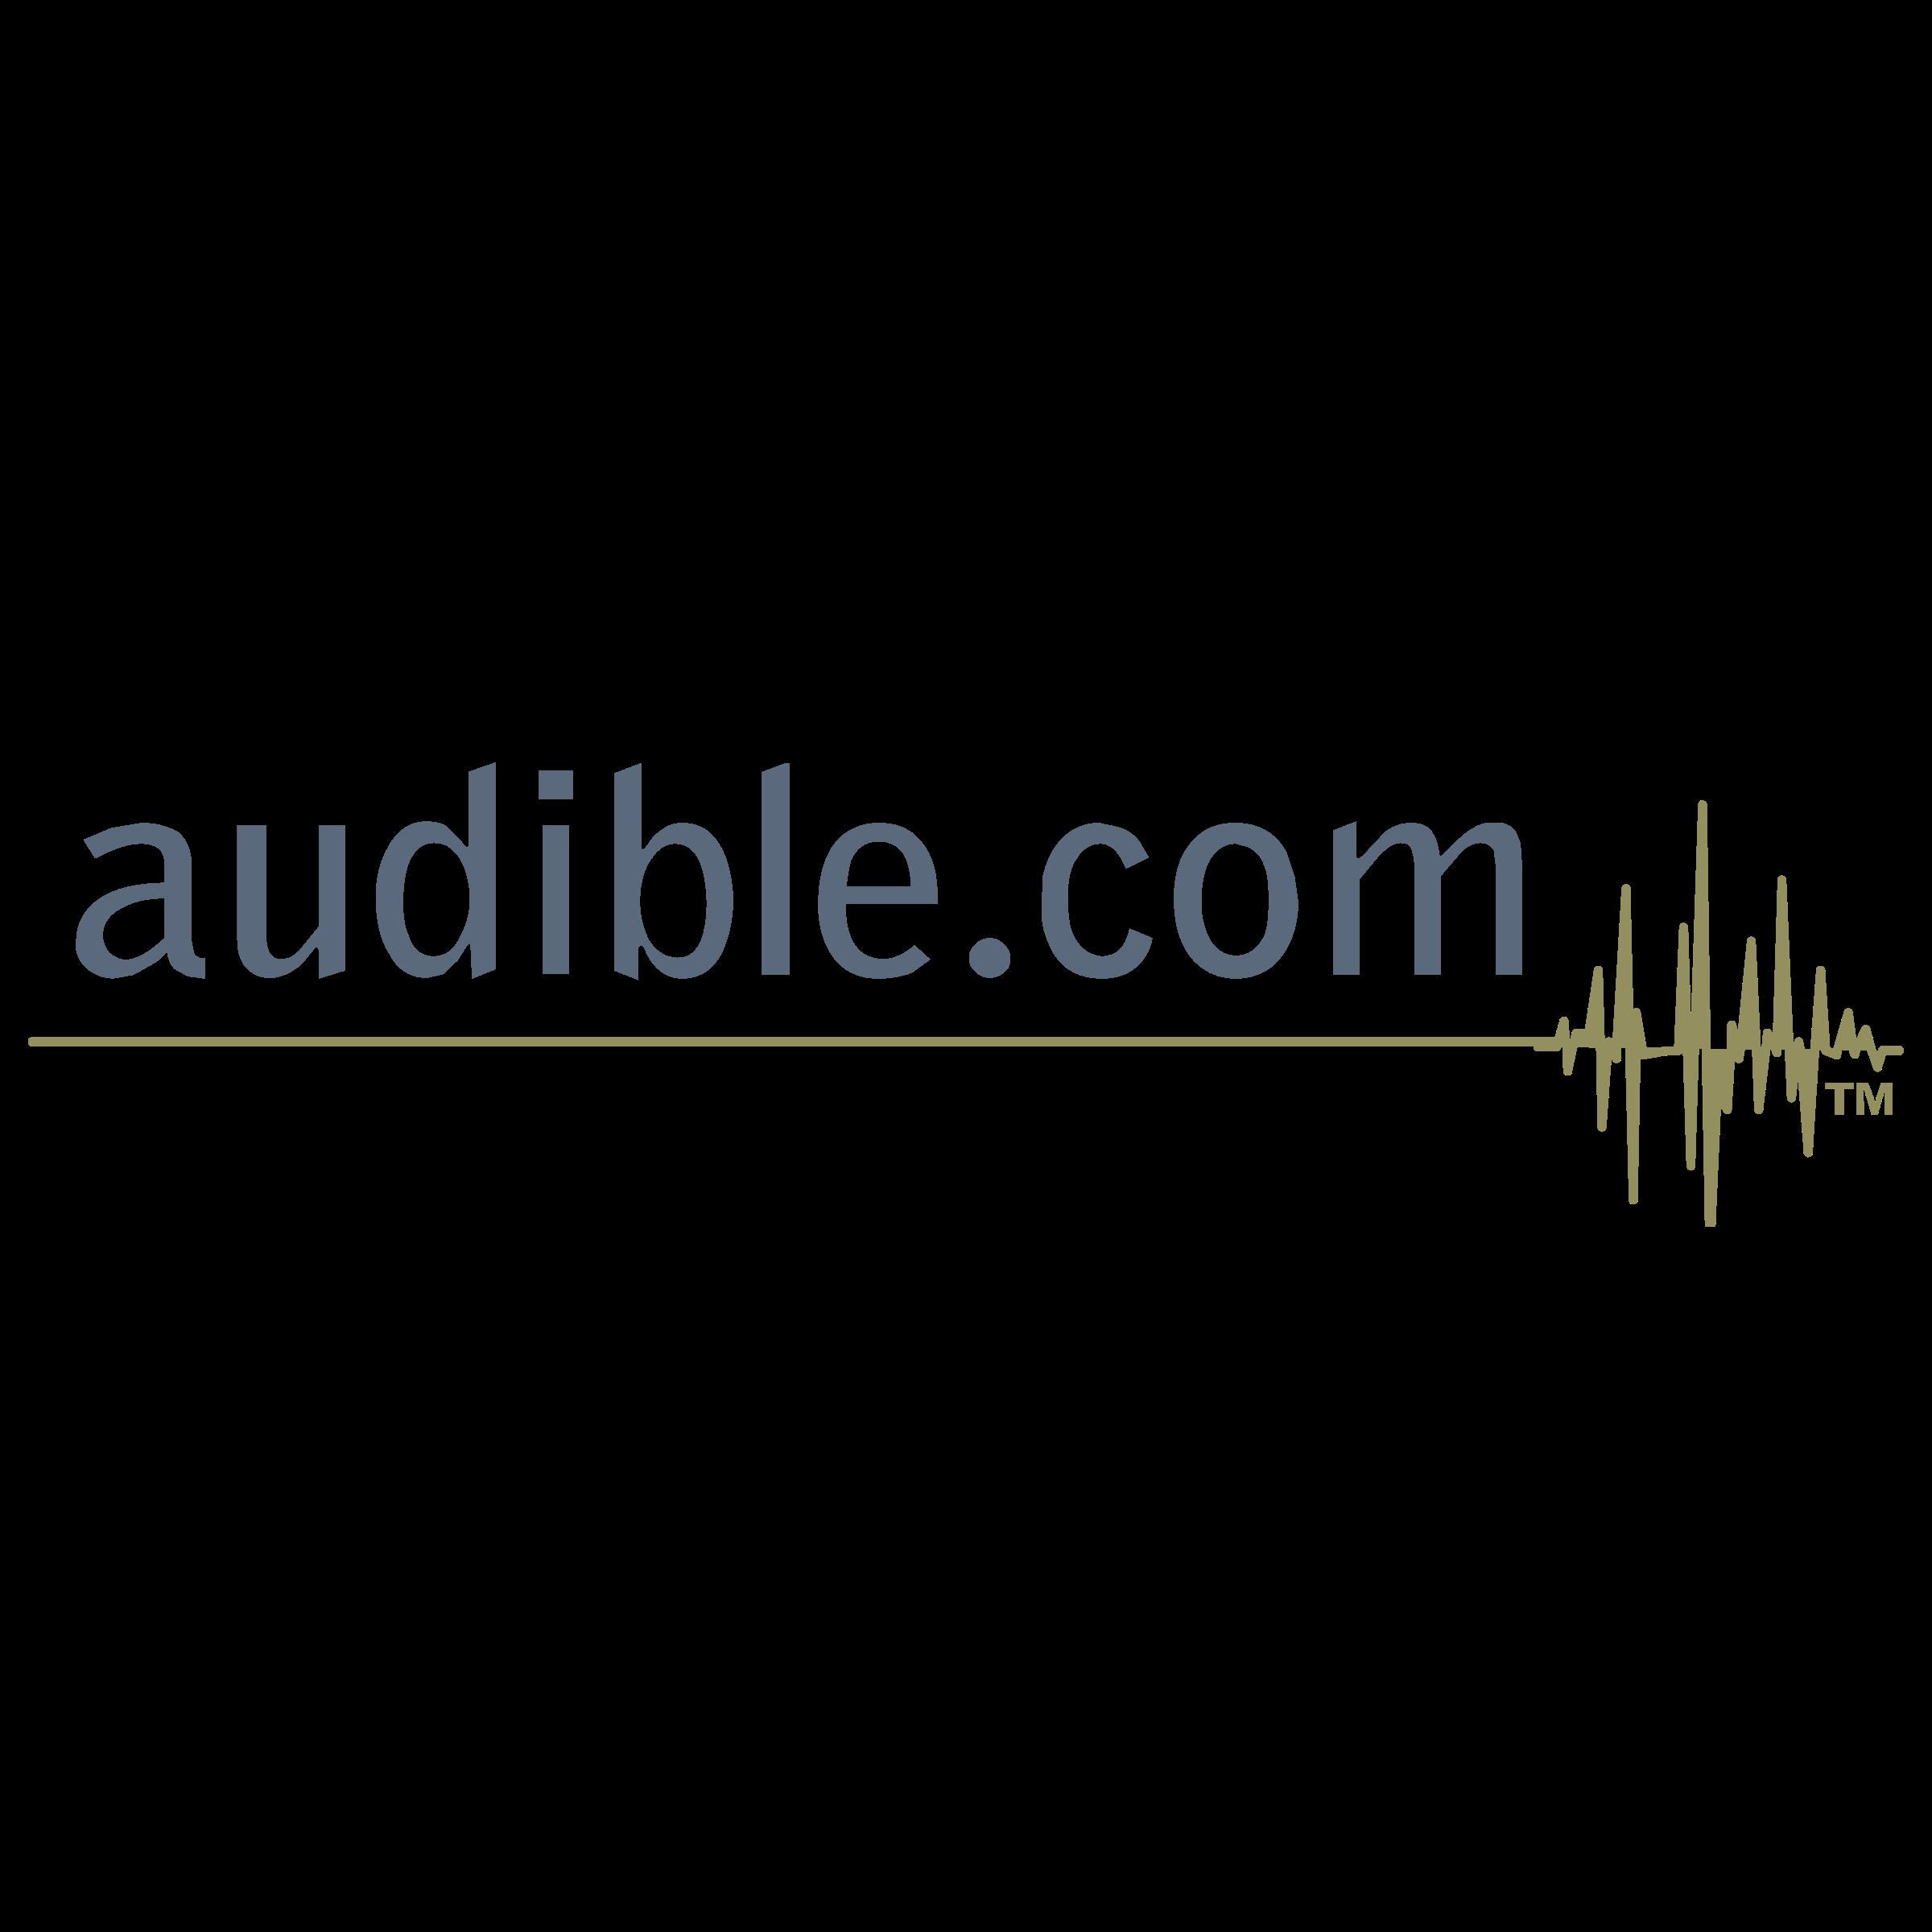 Audible com Logo PNG Transparent & SVG Vector.